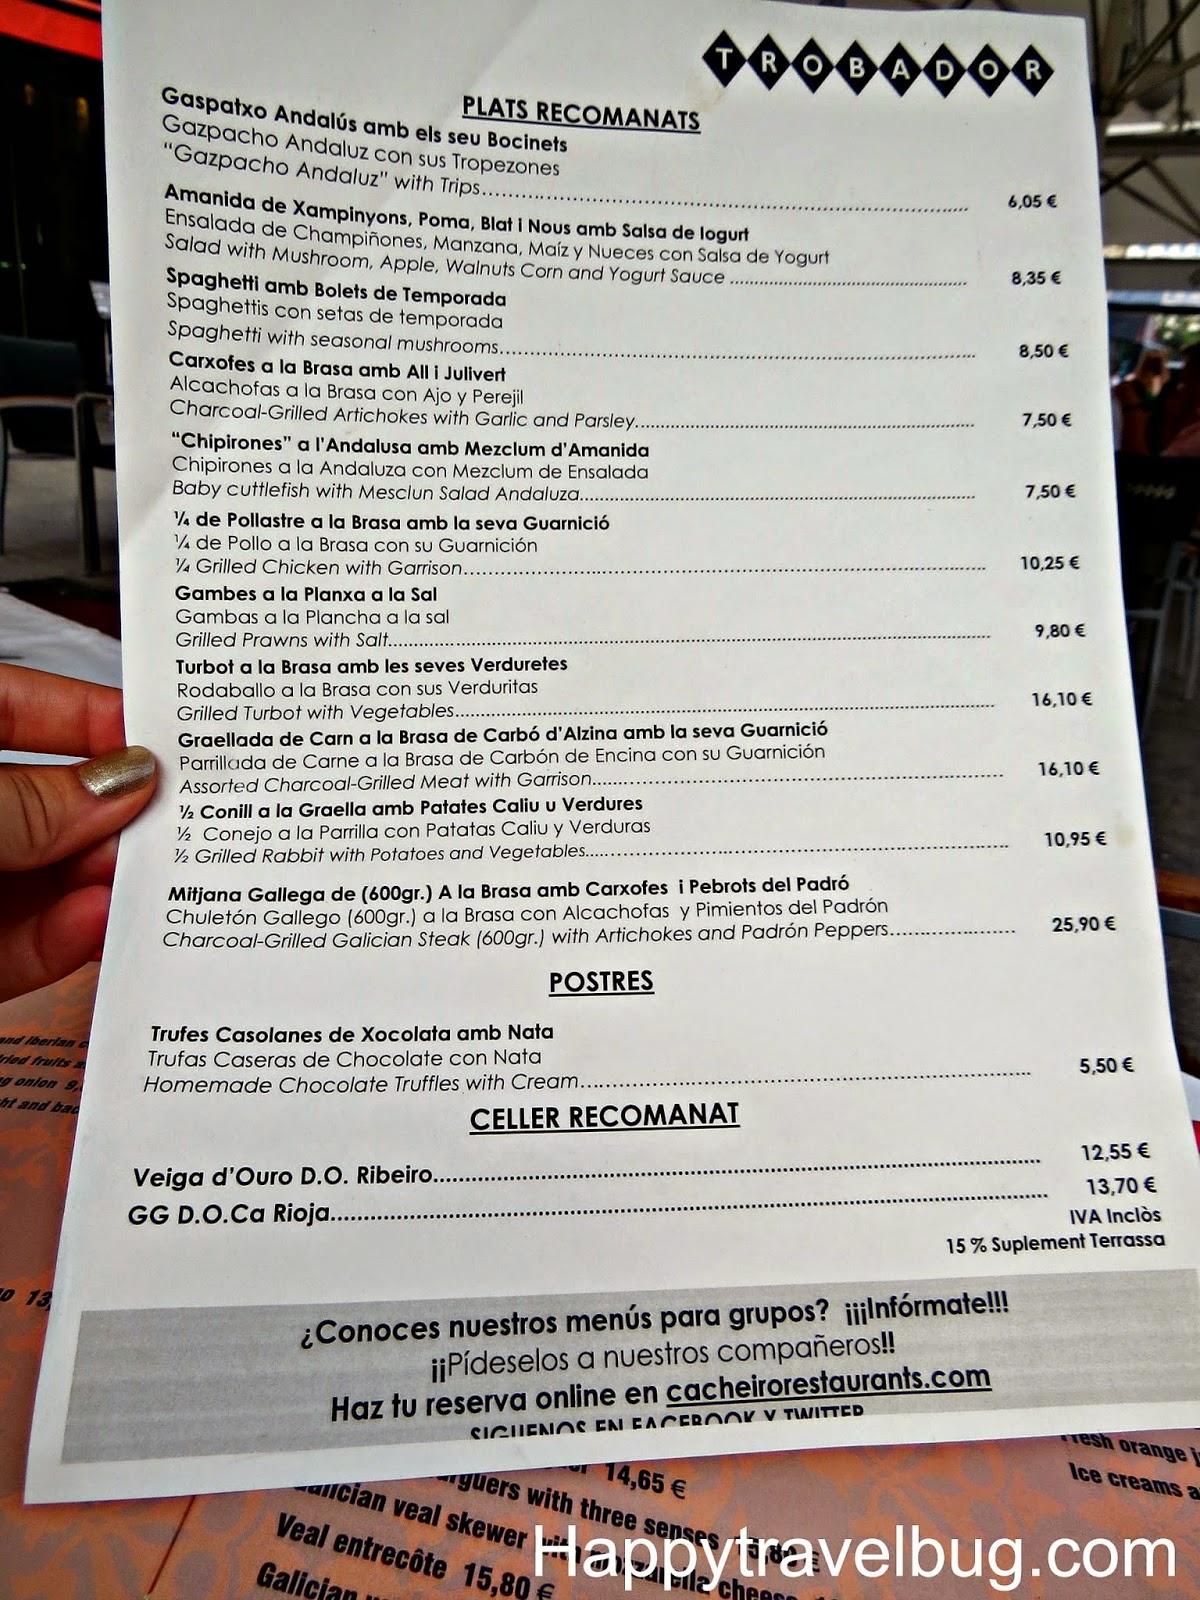 Trobador menu in Barcelona, Spain